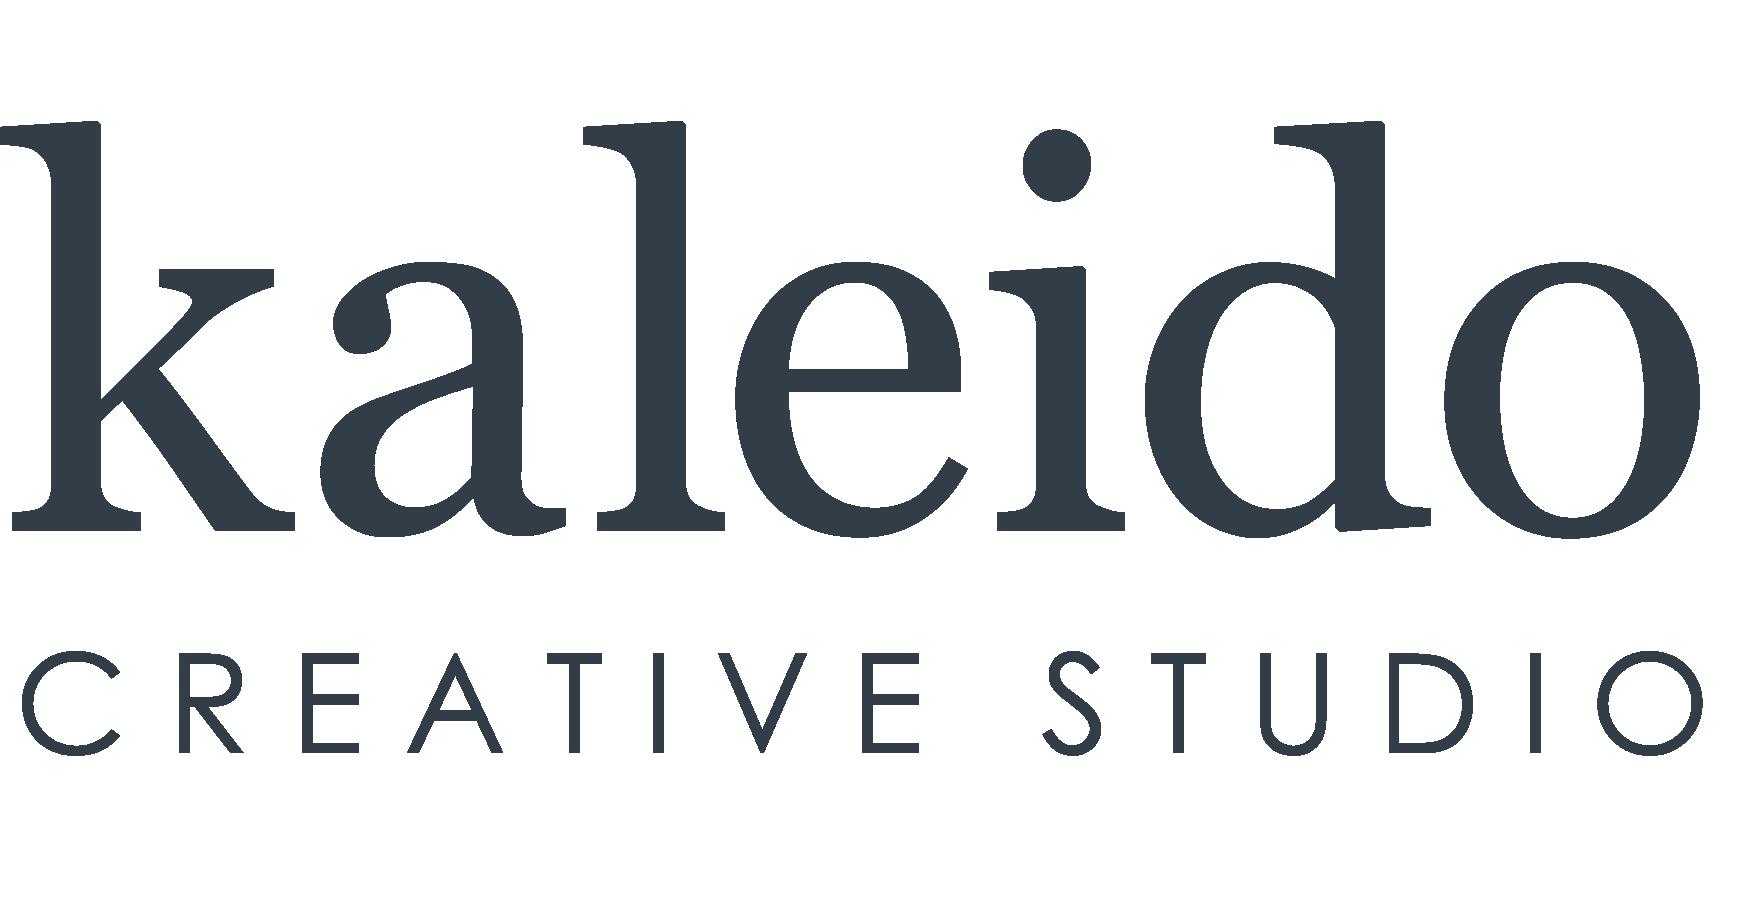 Kaleido Creative Studio logo